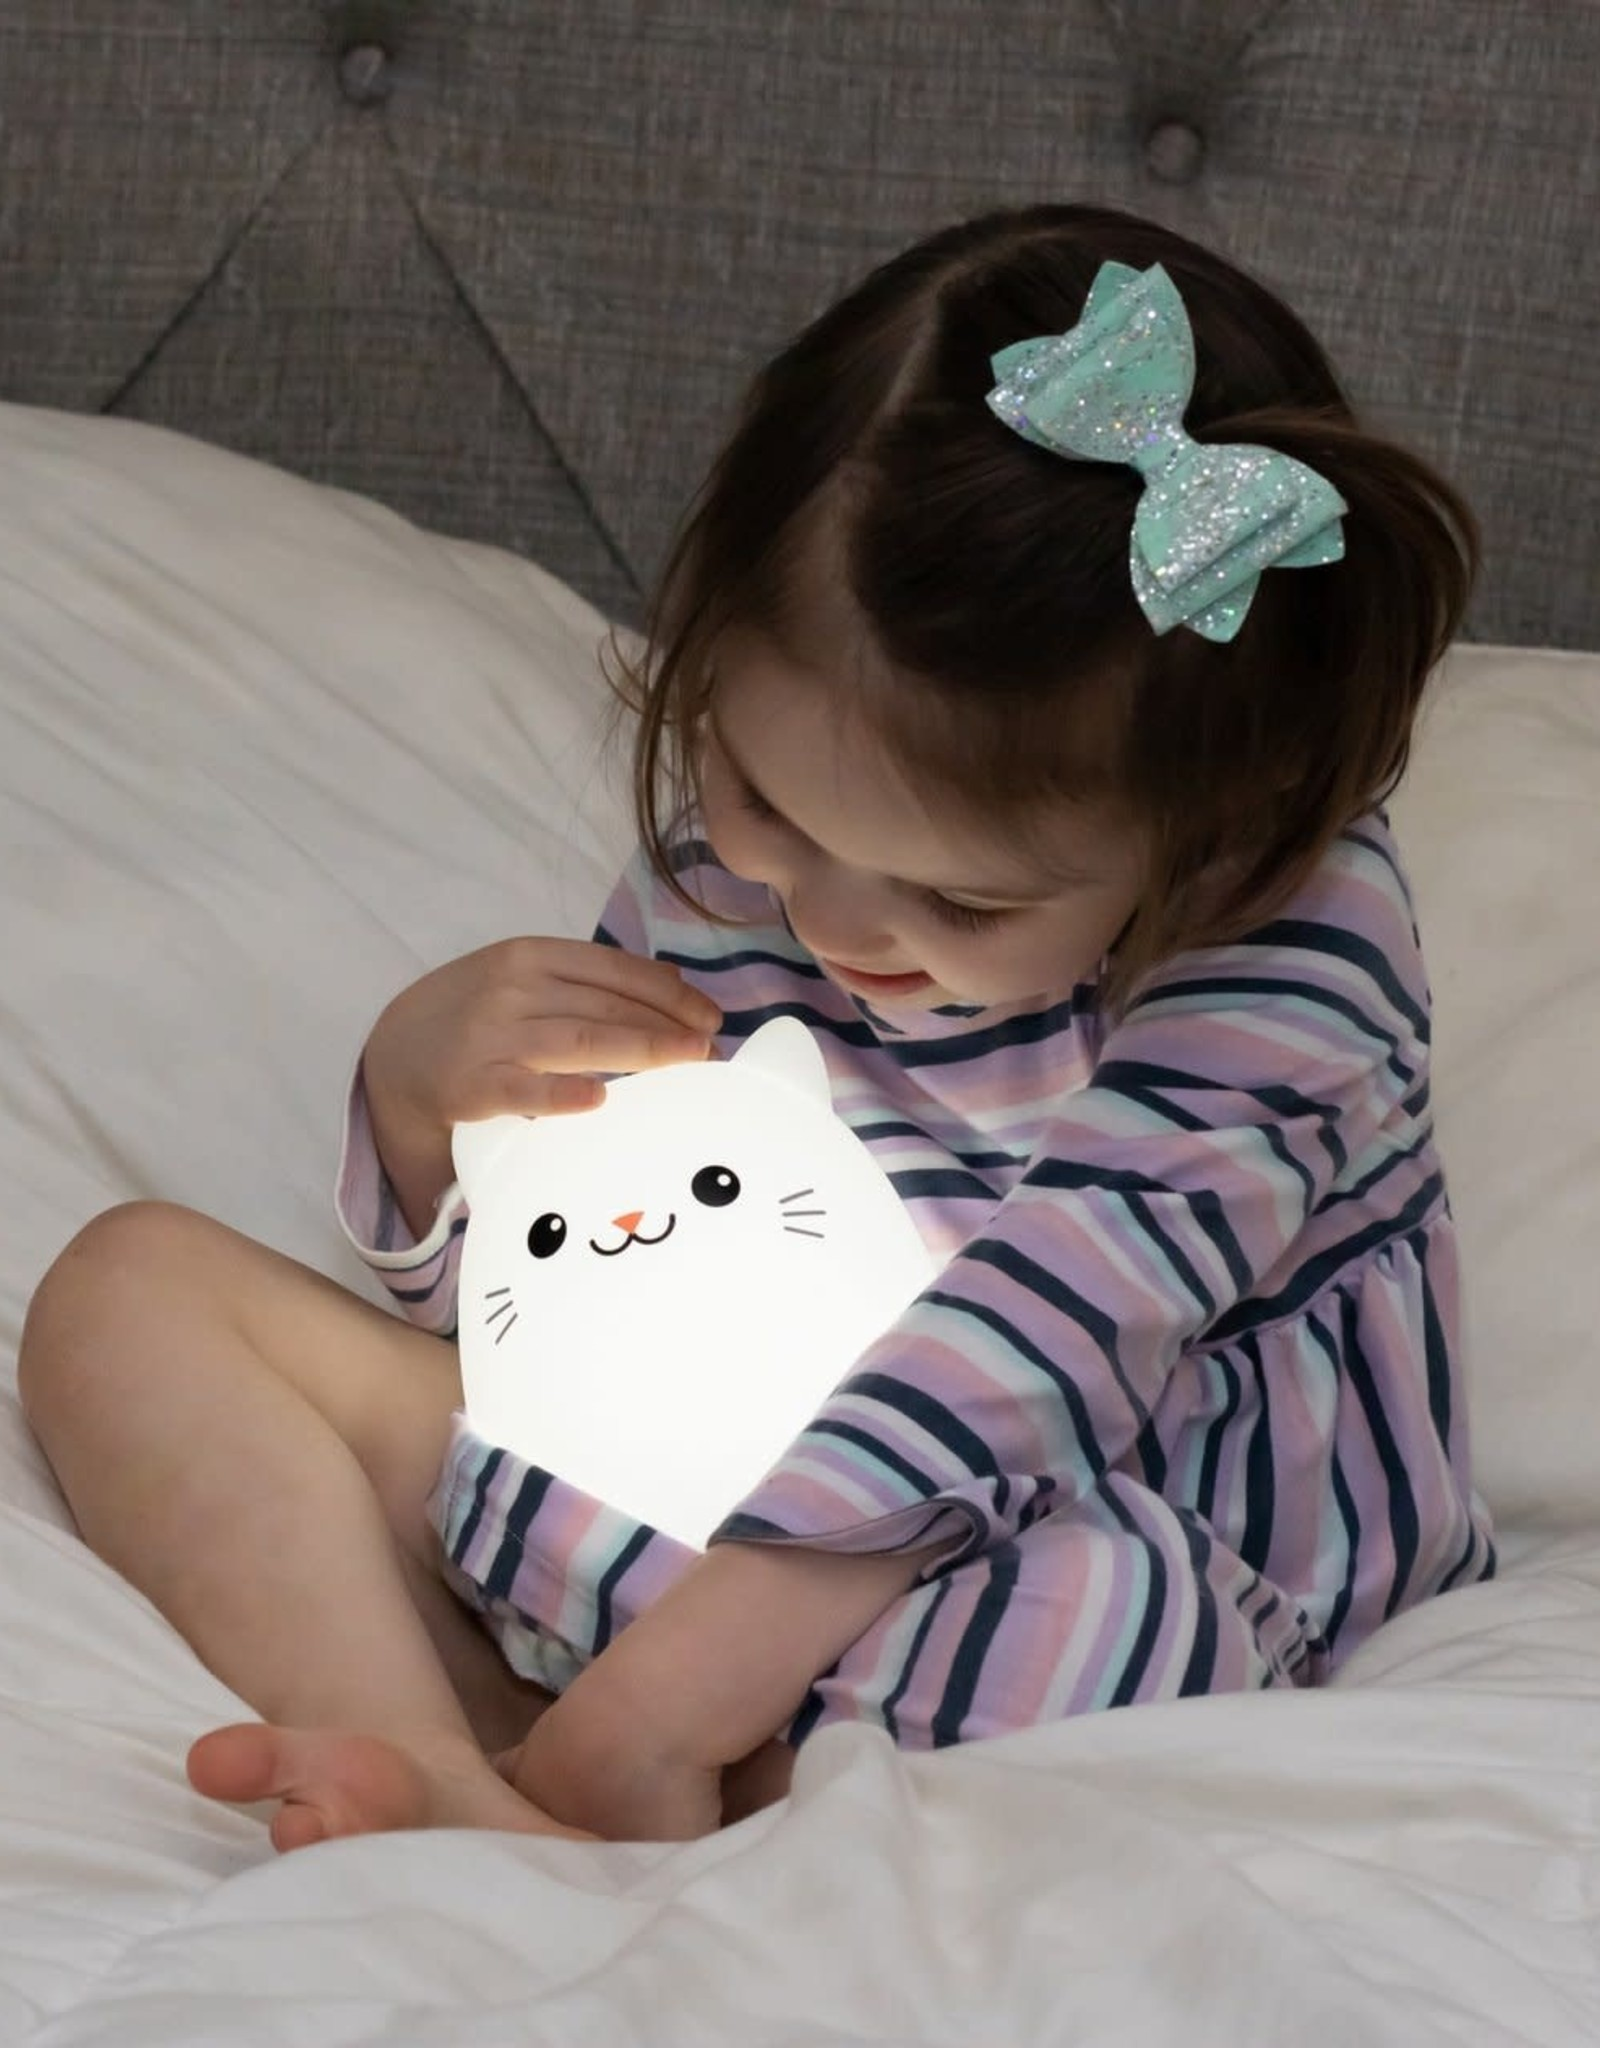 Lumieworld LumiPet Cat Night Light